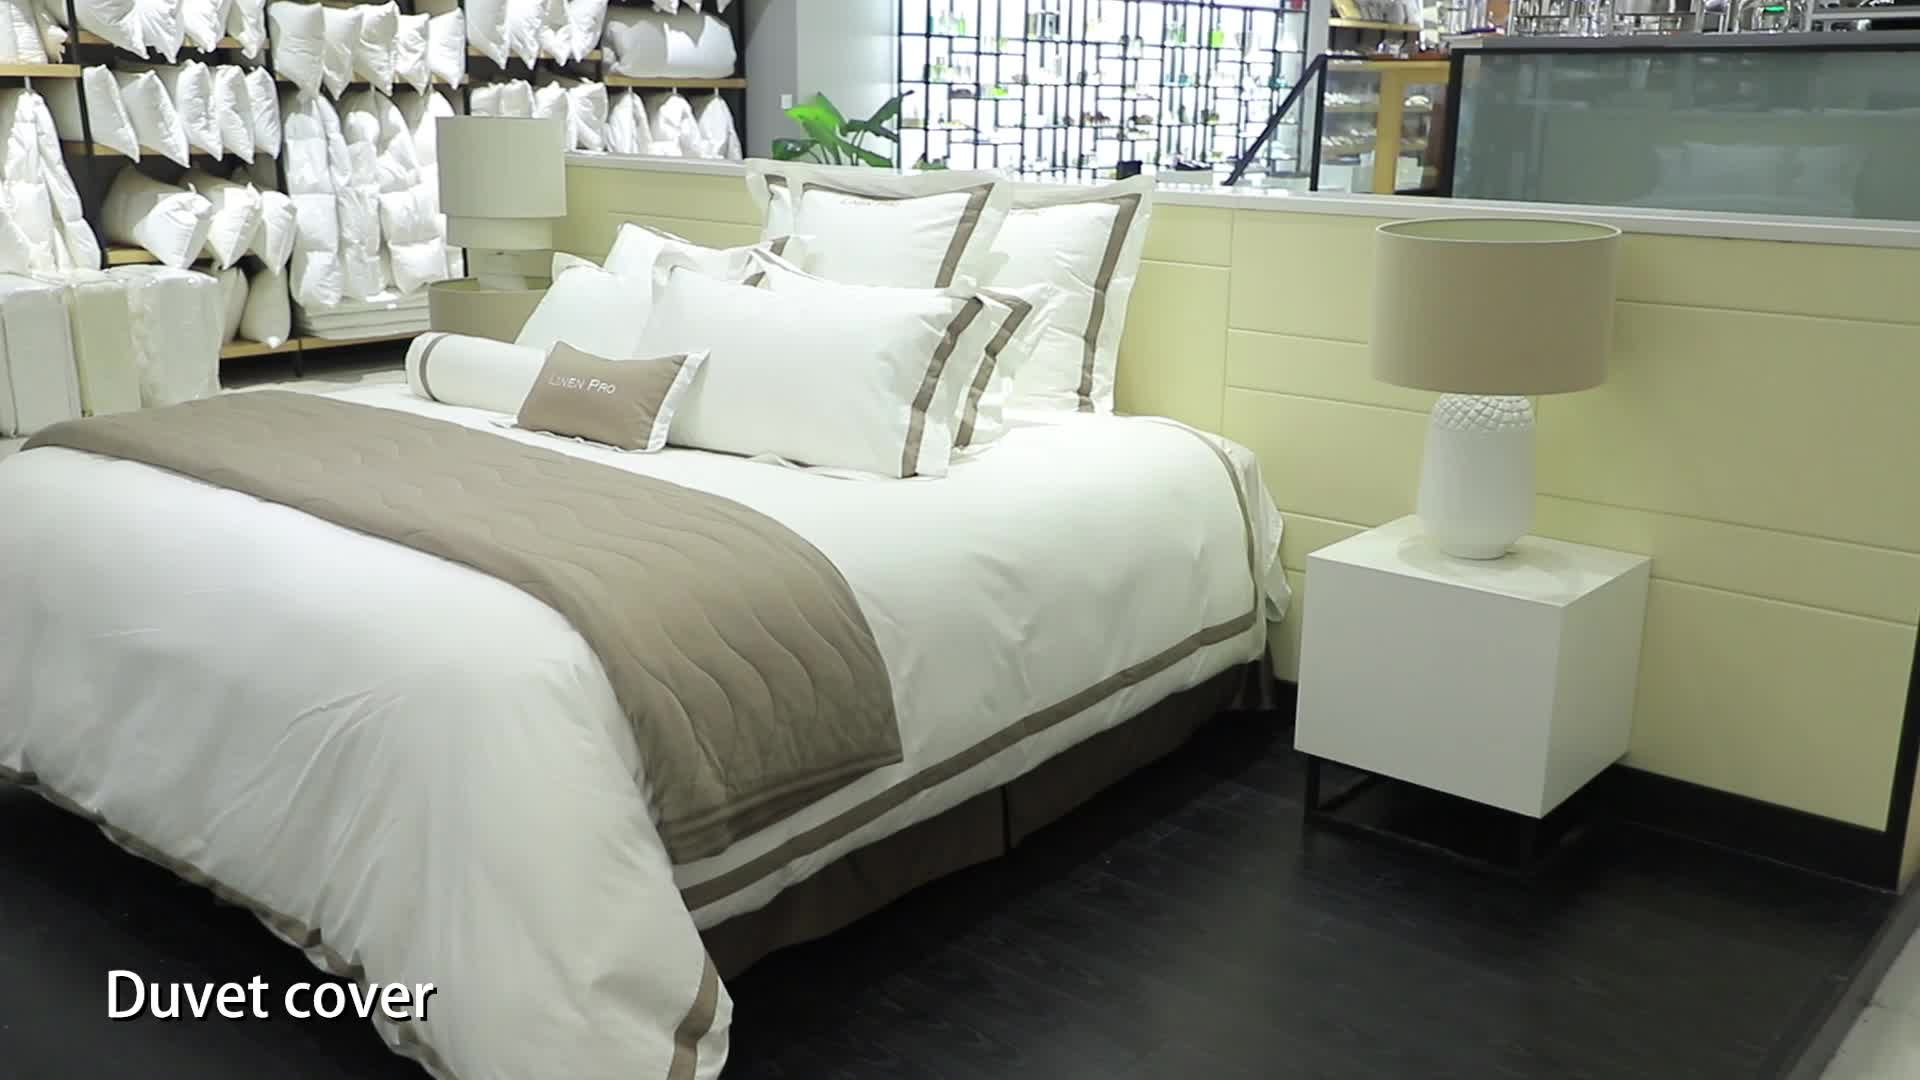 Eliya Disesuaikan Ukuran Raja Kapas Busa Memori Hotel Bintang 5 Tempat Tidur Kasur untuk Hilton